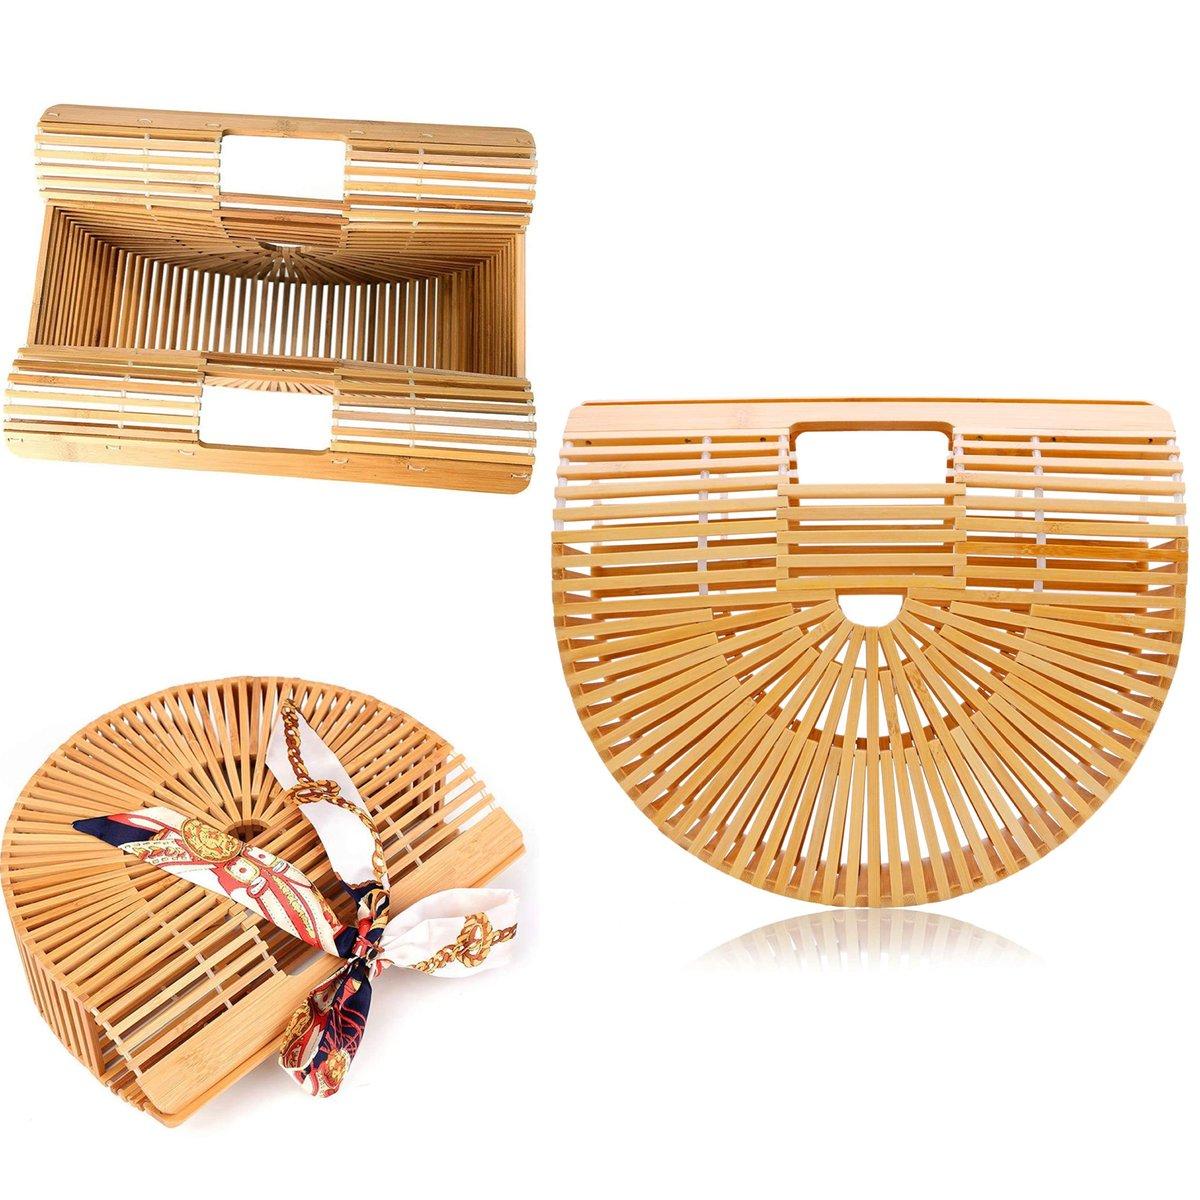 Image of Bamboo Purse